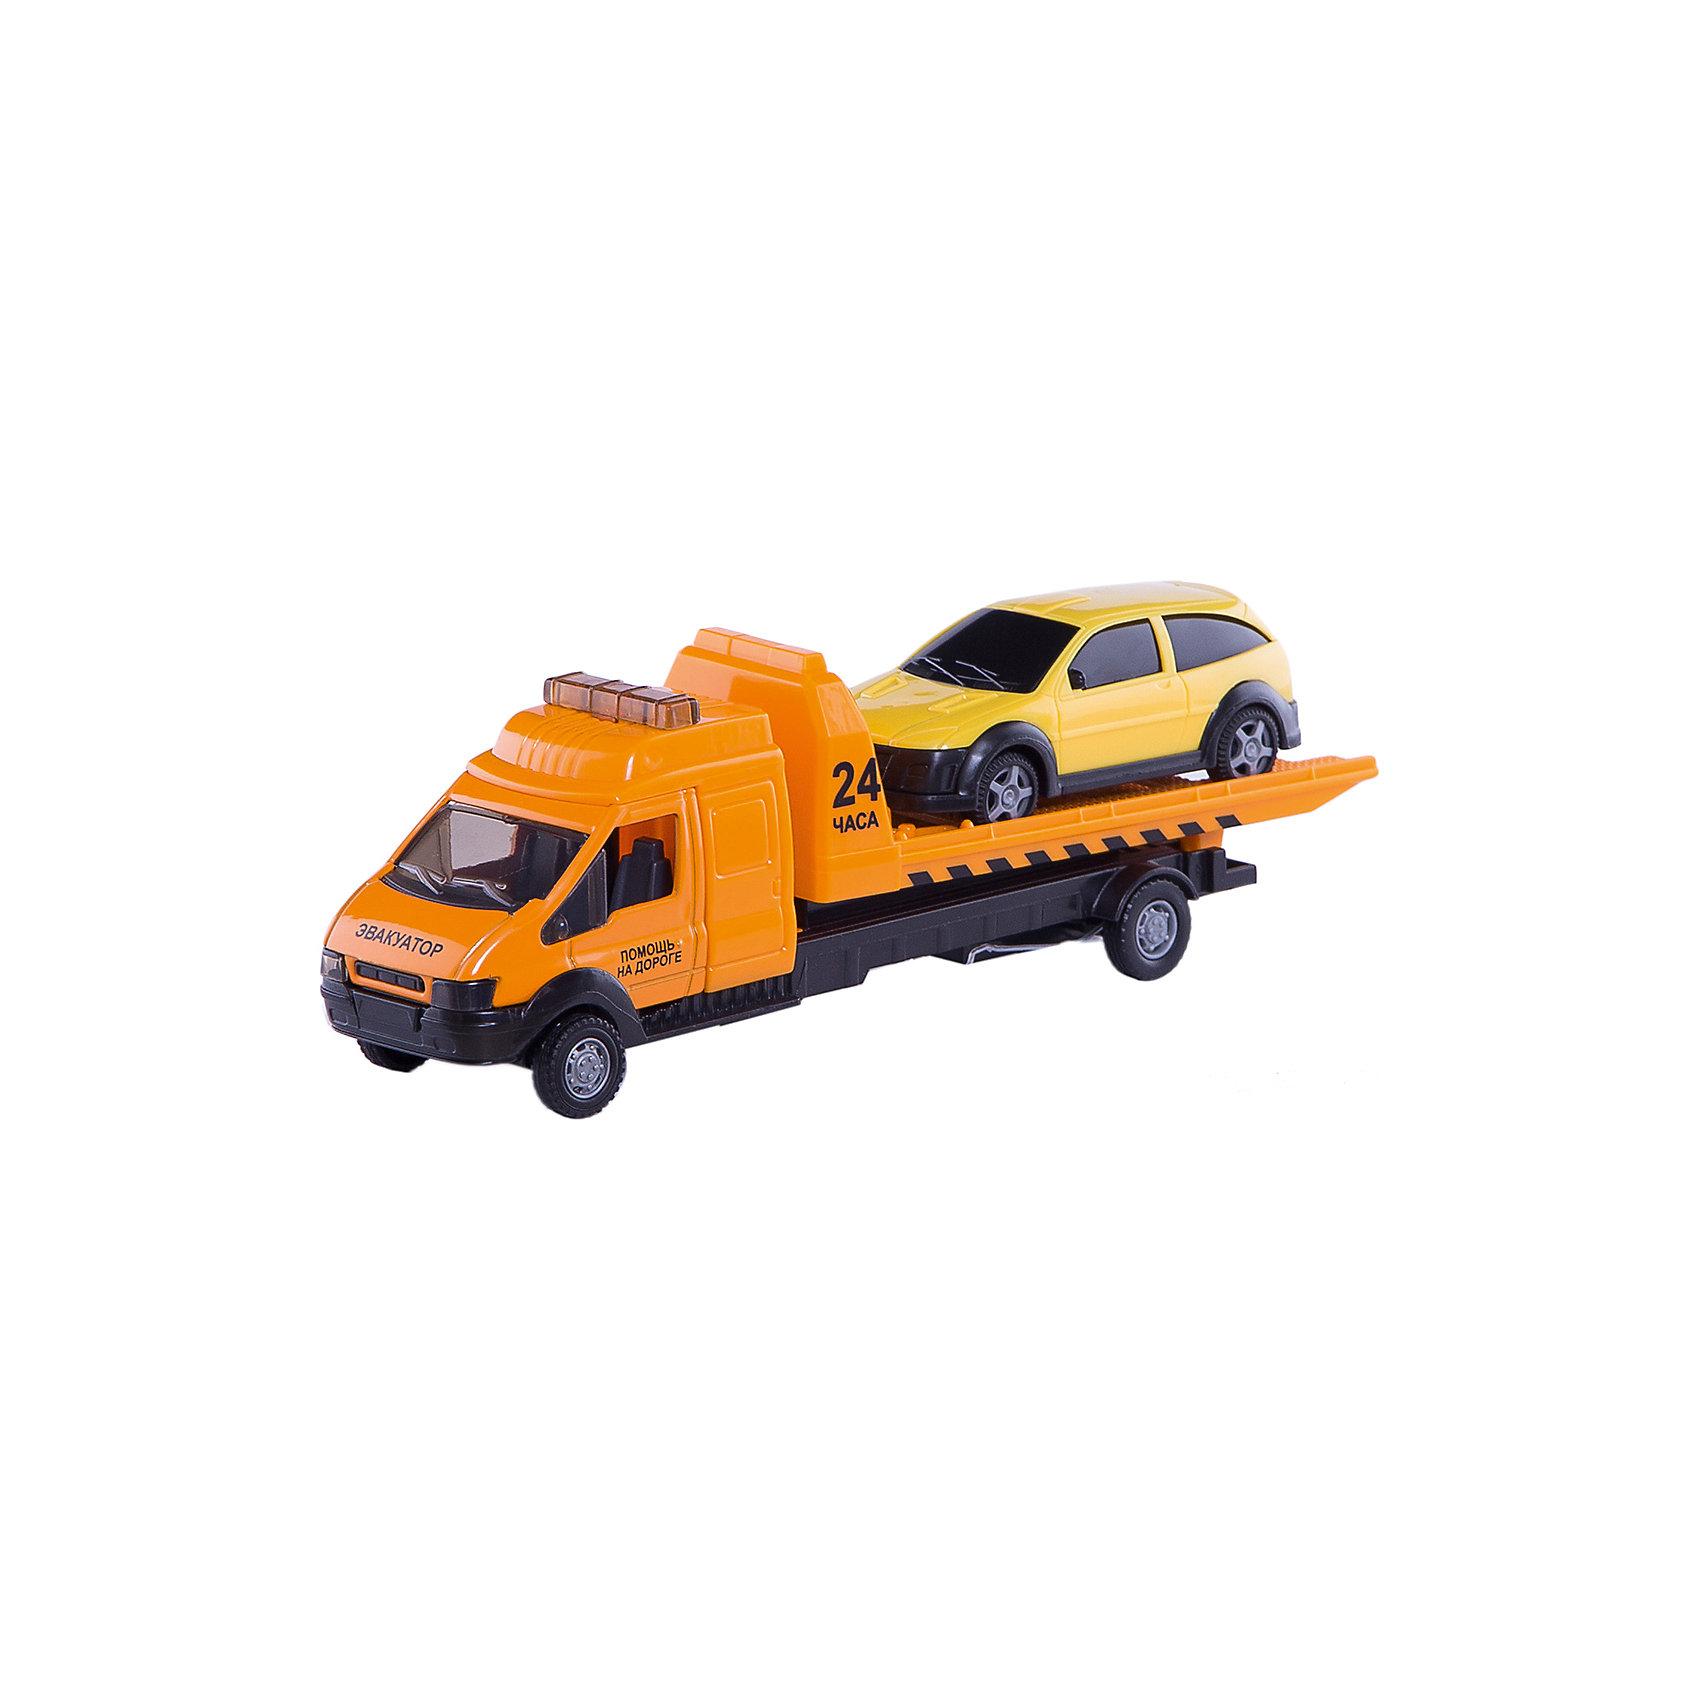 Машинка Recovery Truck эвакуатор 1:48, AutotimeМашинки<br><br><br>Ширина мм: 362<br>Глубина мм: 114<br>Высота мм: 146<br>Вес г: 15<br>Возраст от месяцев: 36<br>Возраст до месяцев: 2147483647<br>Пол: Мужской<br>Возраст: Детский<br>SKU: 5584144